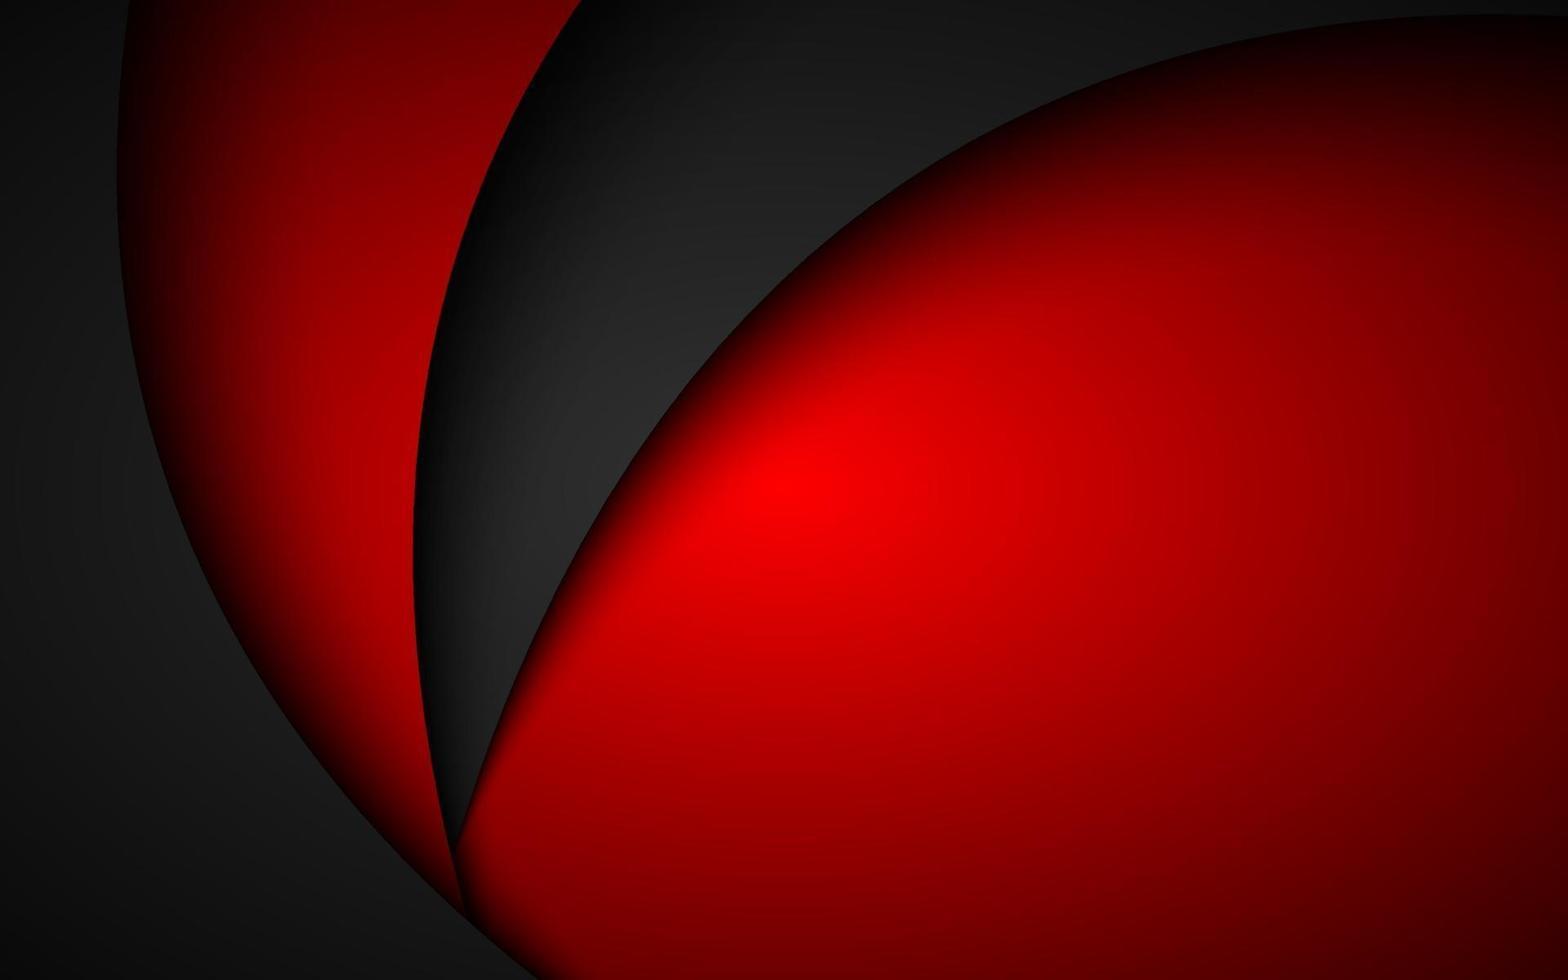 abstracte zwarte en rode golvende achtergrond. modern zakelijk designbehang. overlappen vellen papier vector